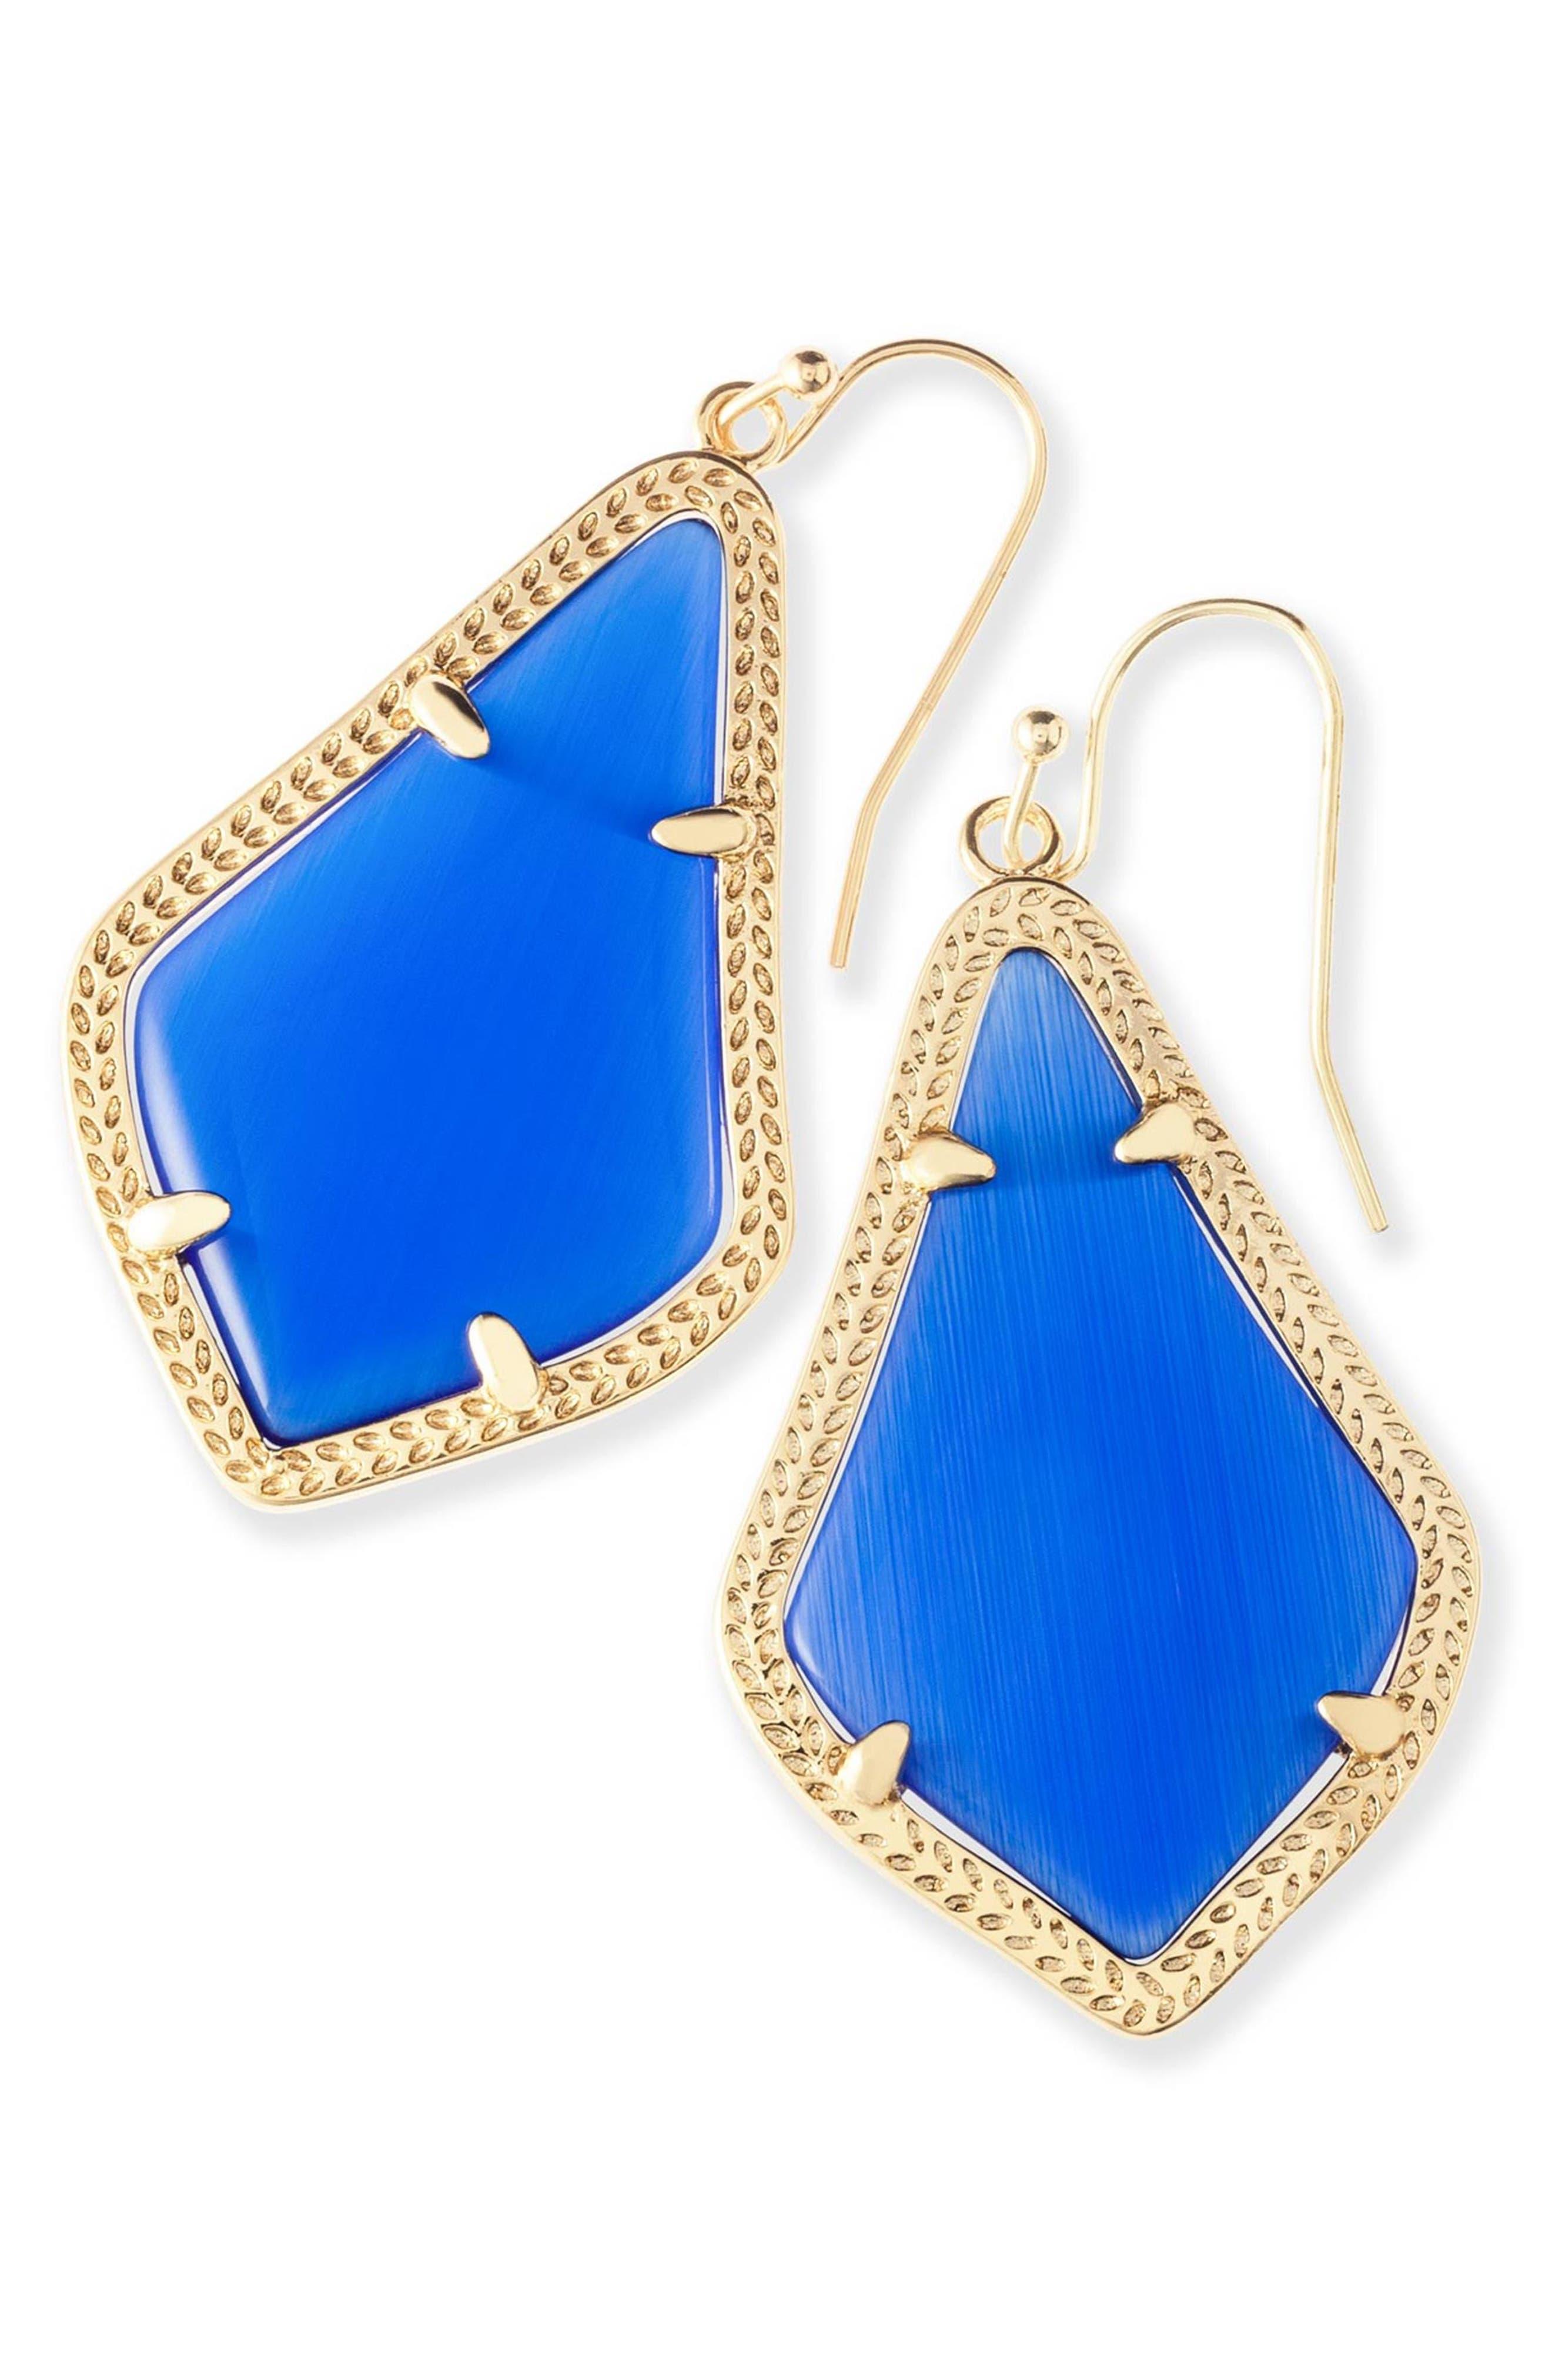 Alex Drop Earrings,                             Main thumbnail 1, color,                             Cobalt Catseye/ Gold